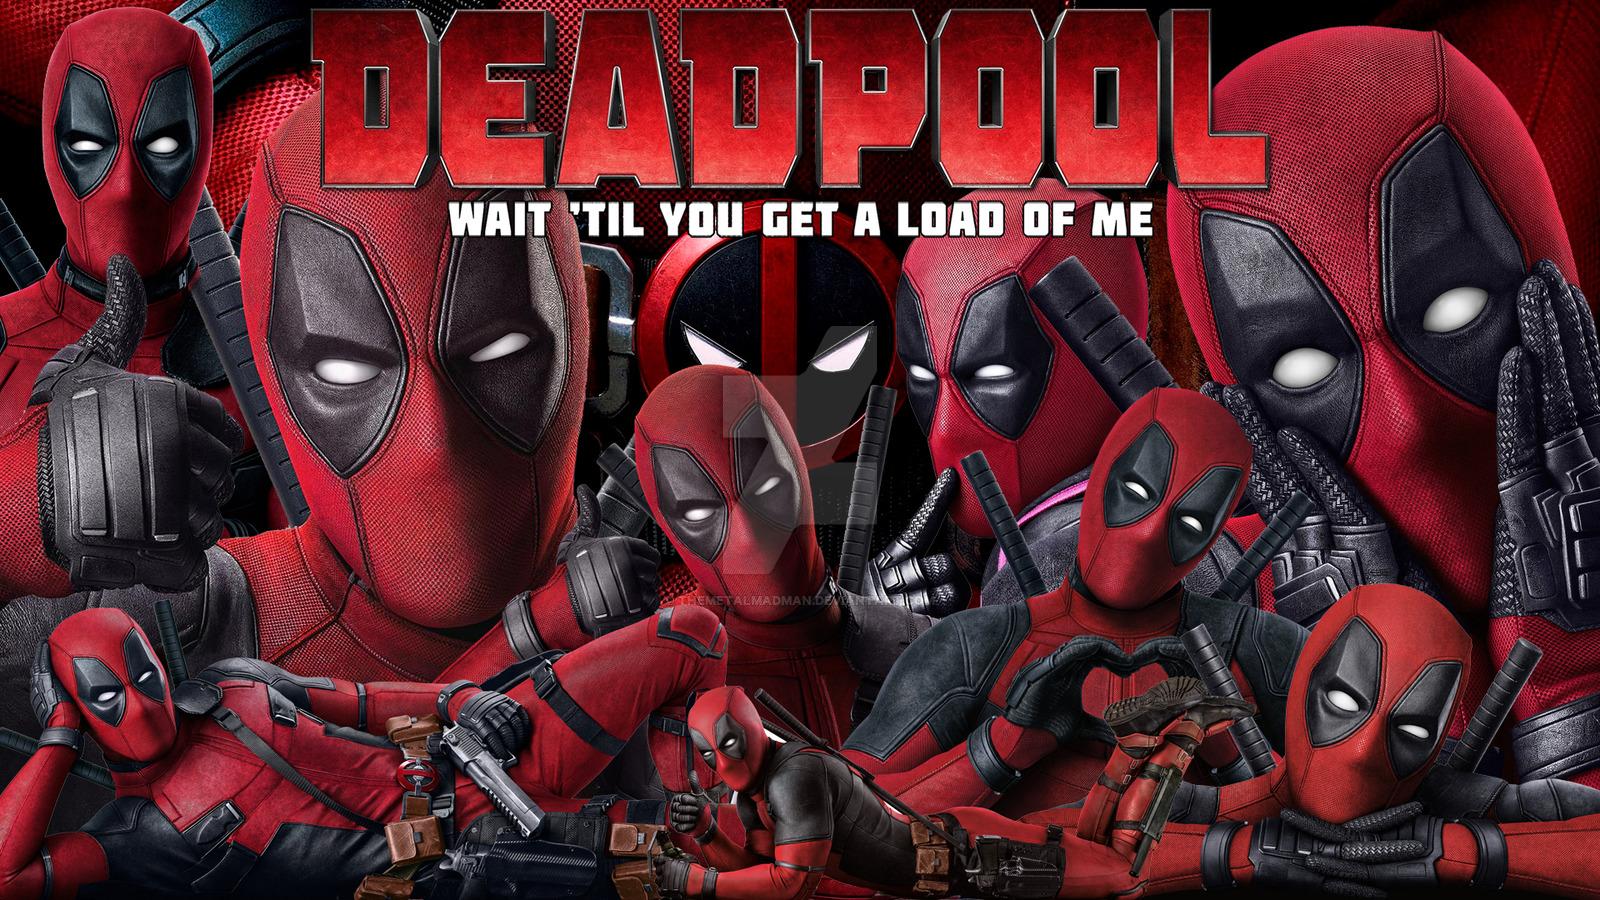 deadpool 2 full movie download 720p english